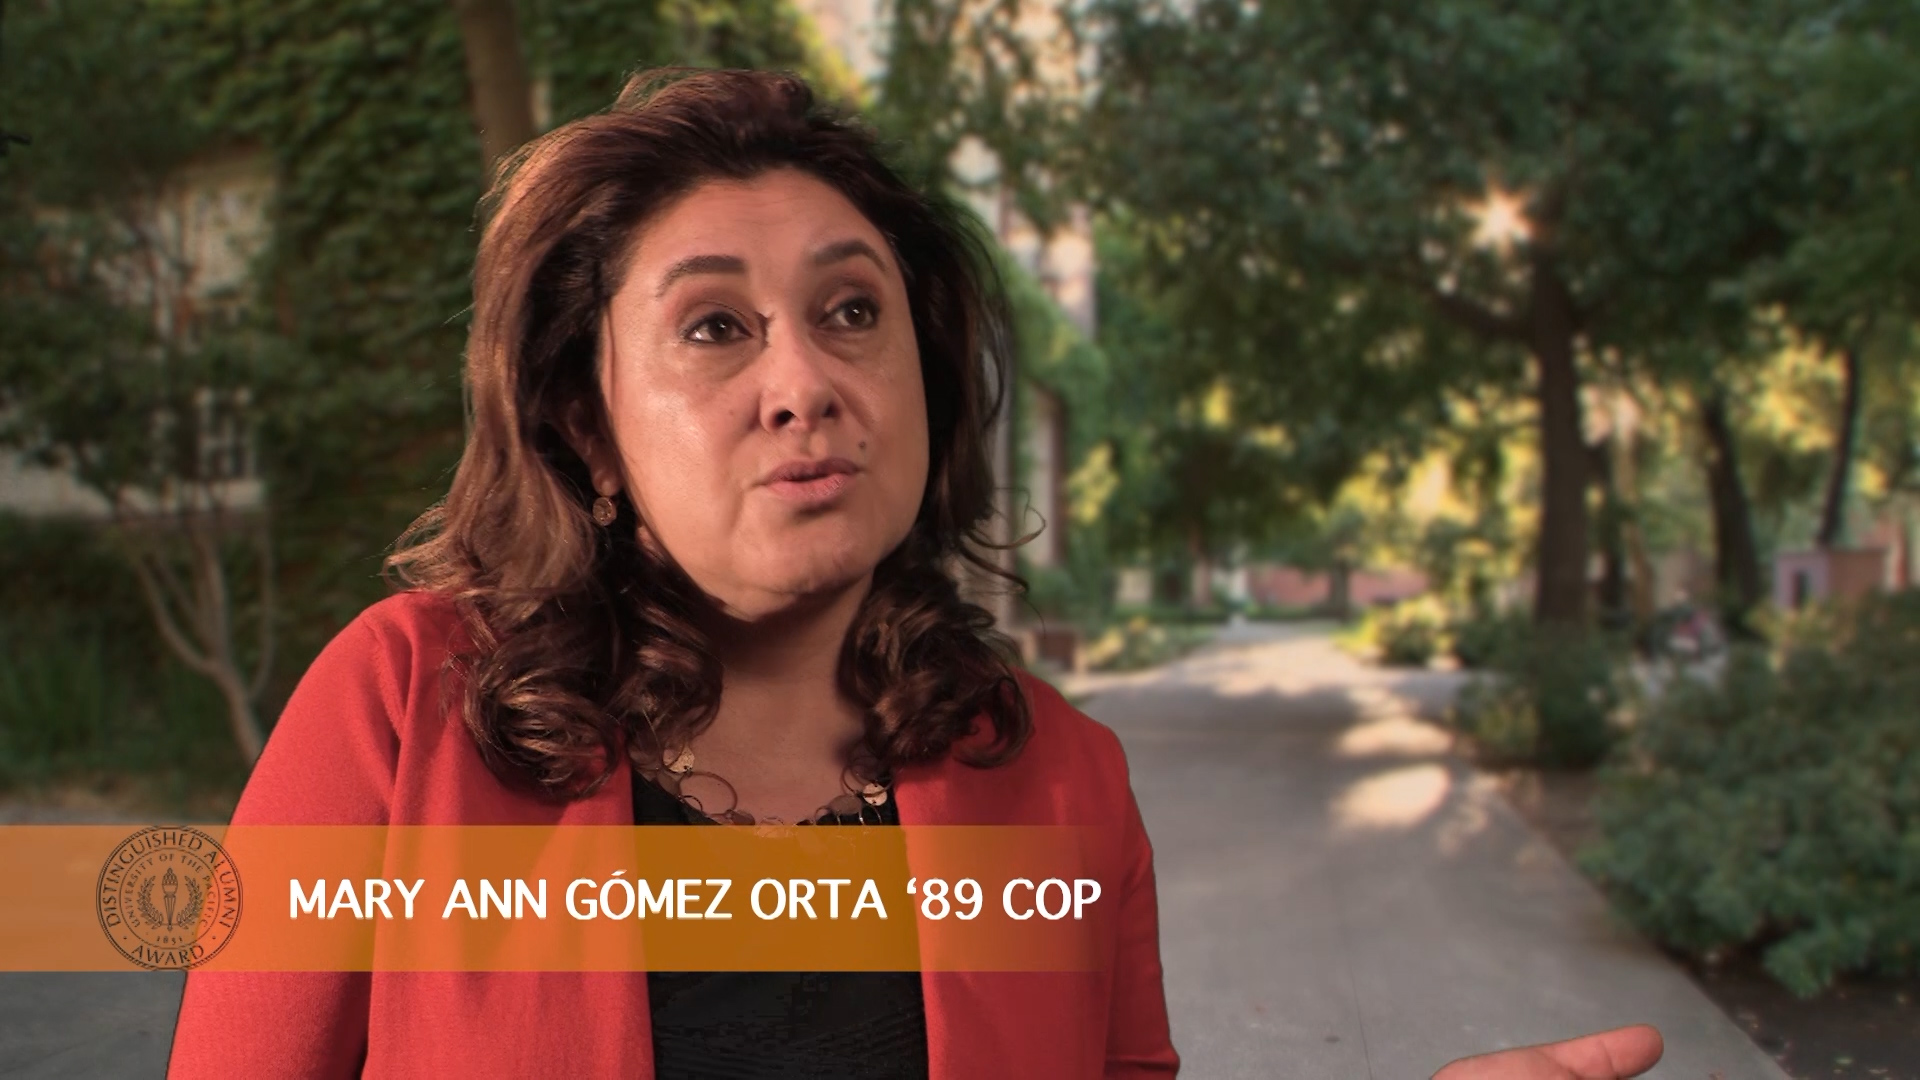 CHLI President & CEO, Mary Ann Gomez Orta, Honored… February 22, 2018